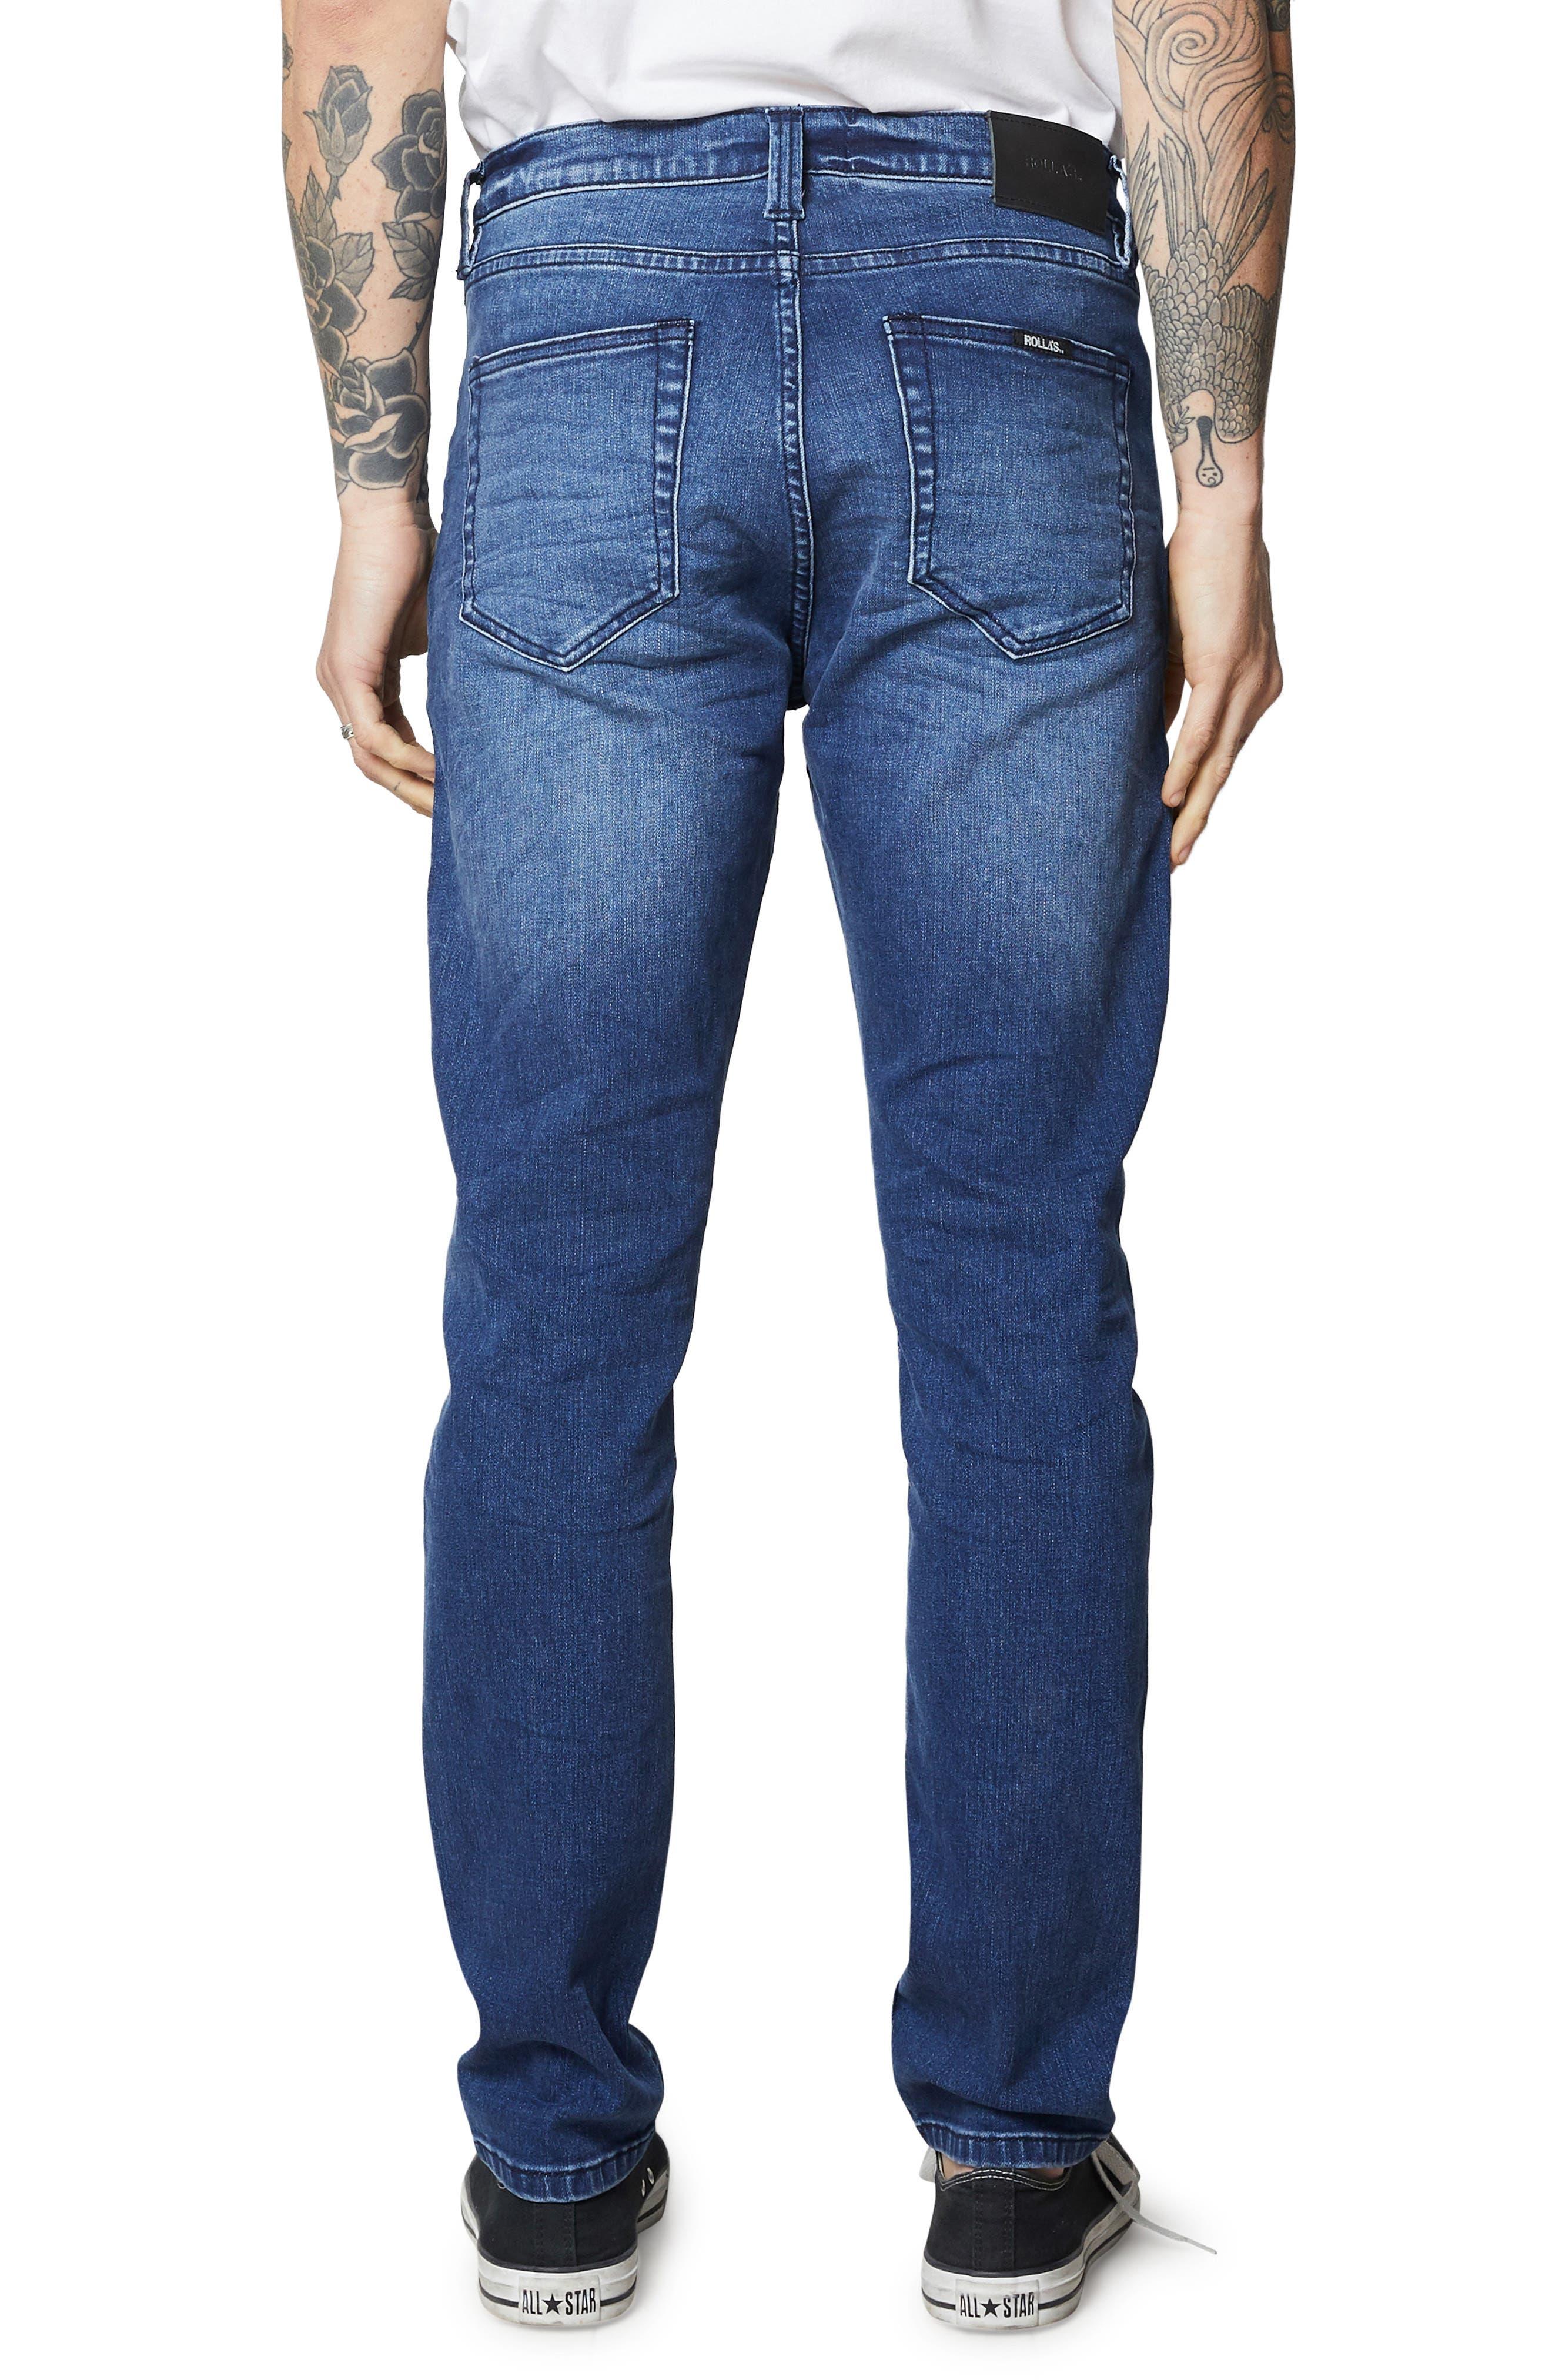 Tim Slims Slim Fit Jeans,                             Alternate thumbnail 2, color,                             FOSTERS BLUE